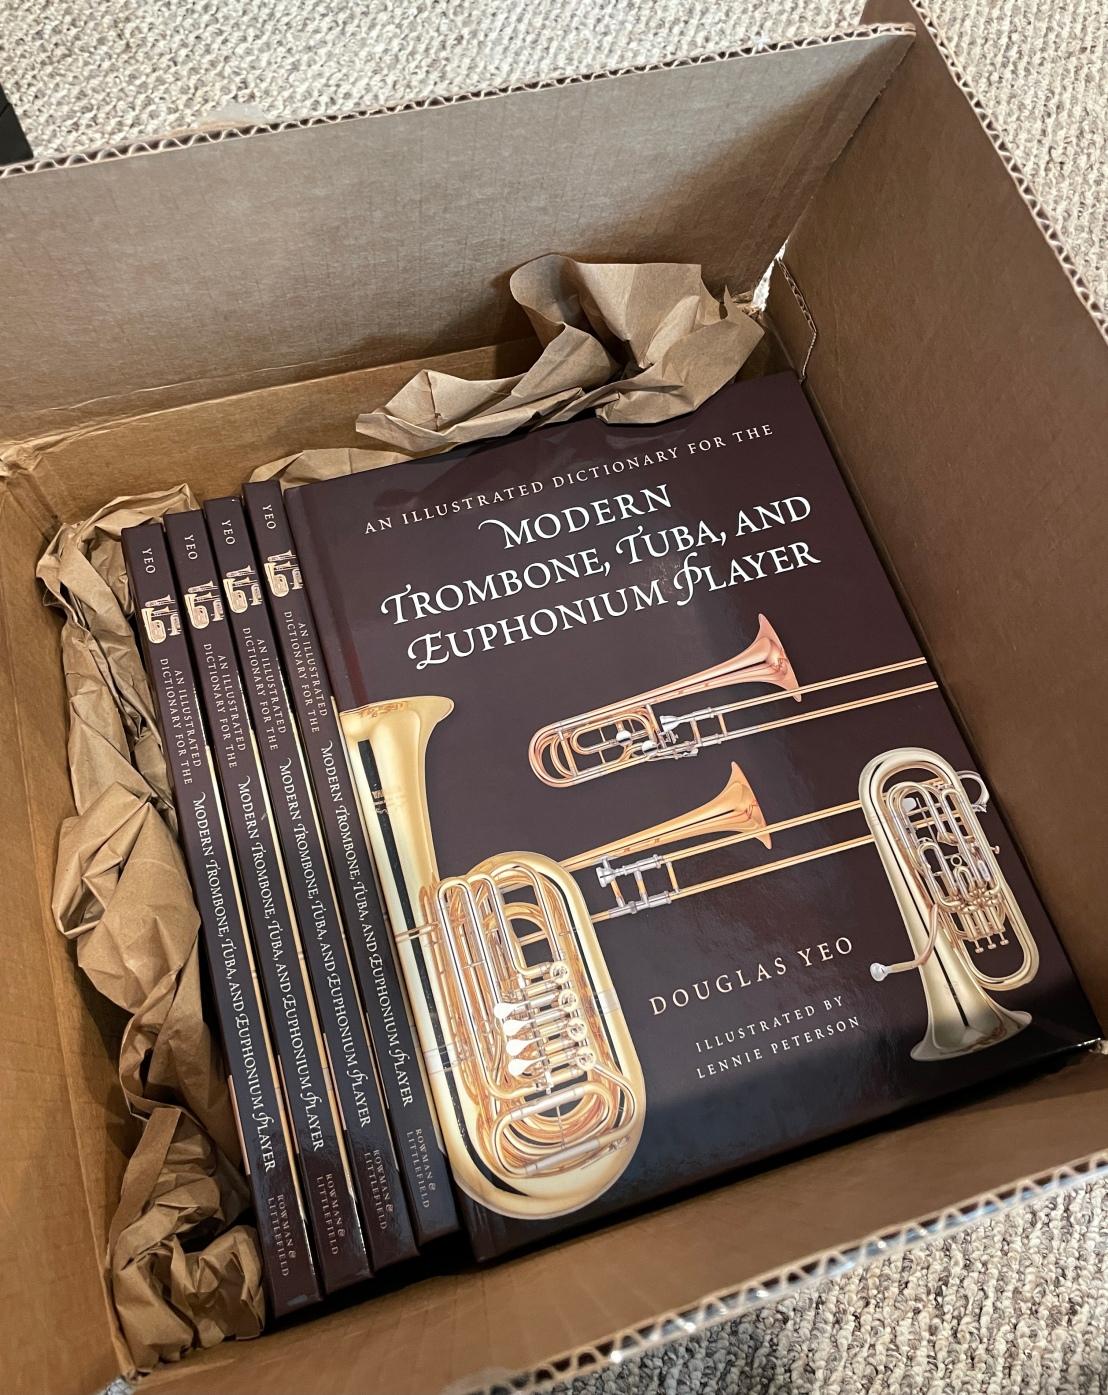 Yeo_Dictionary_box_of_books